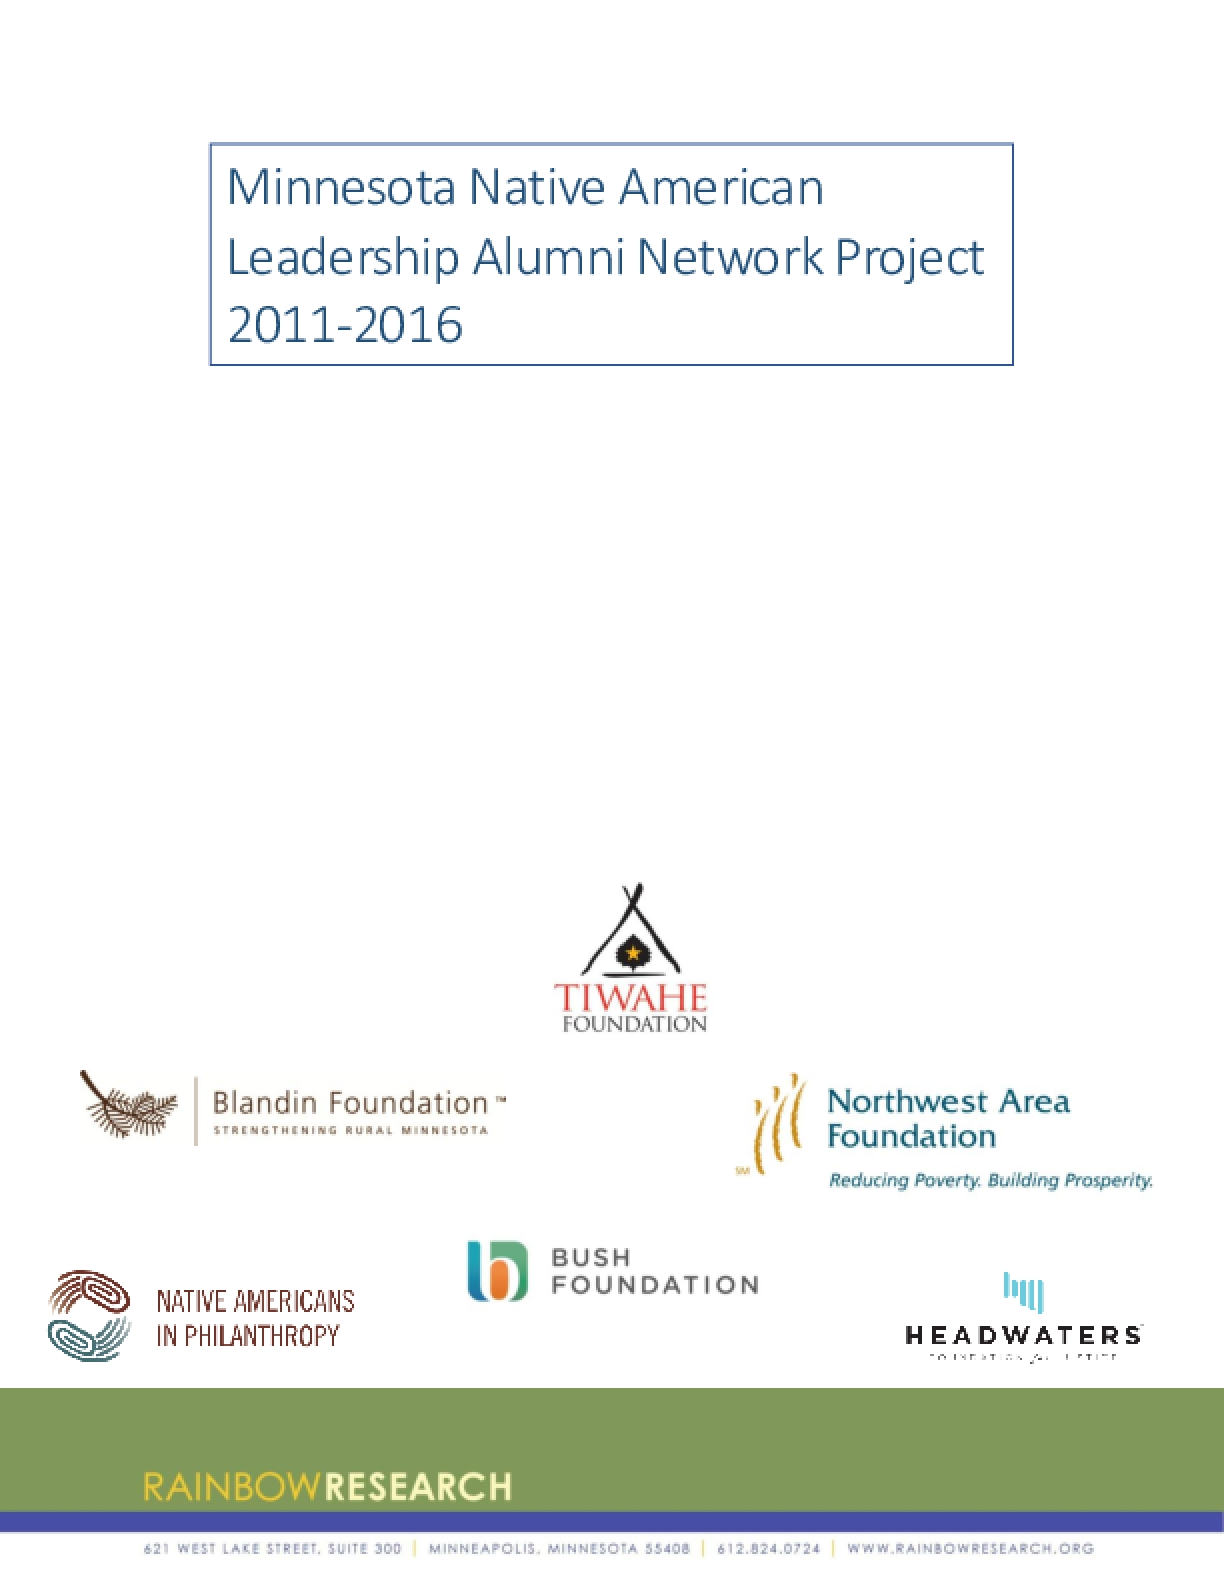 Minnesota Native American Leadership Alumni Network Project 2011-2016